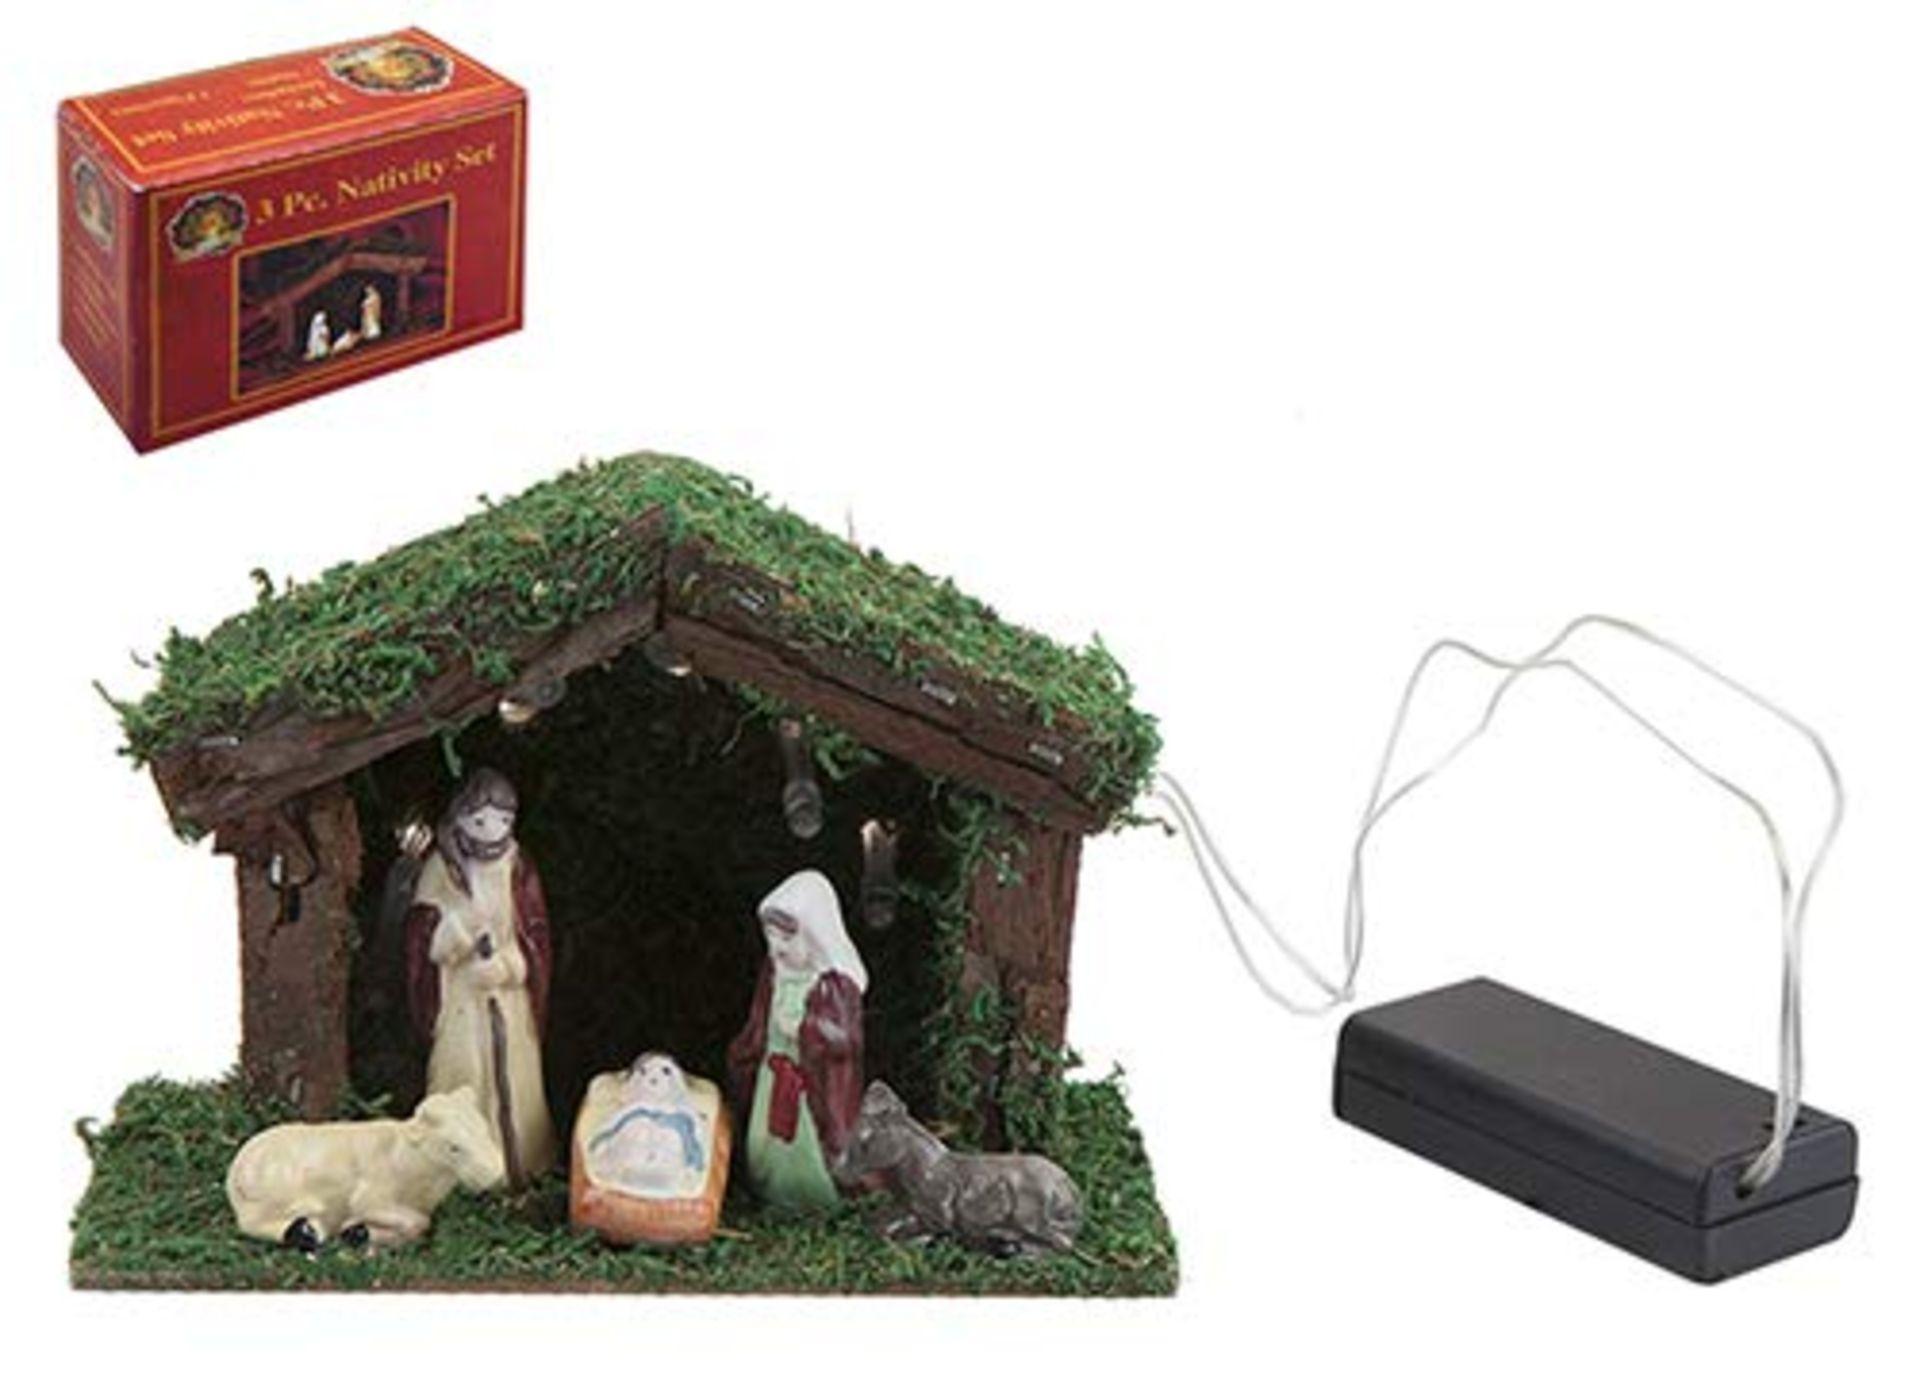 Lot 18102 - V Brand New Five Piece LED Nativity Play 14 x 16 x 10cm